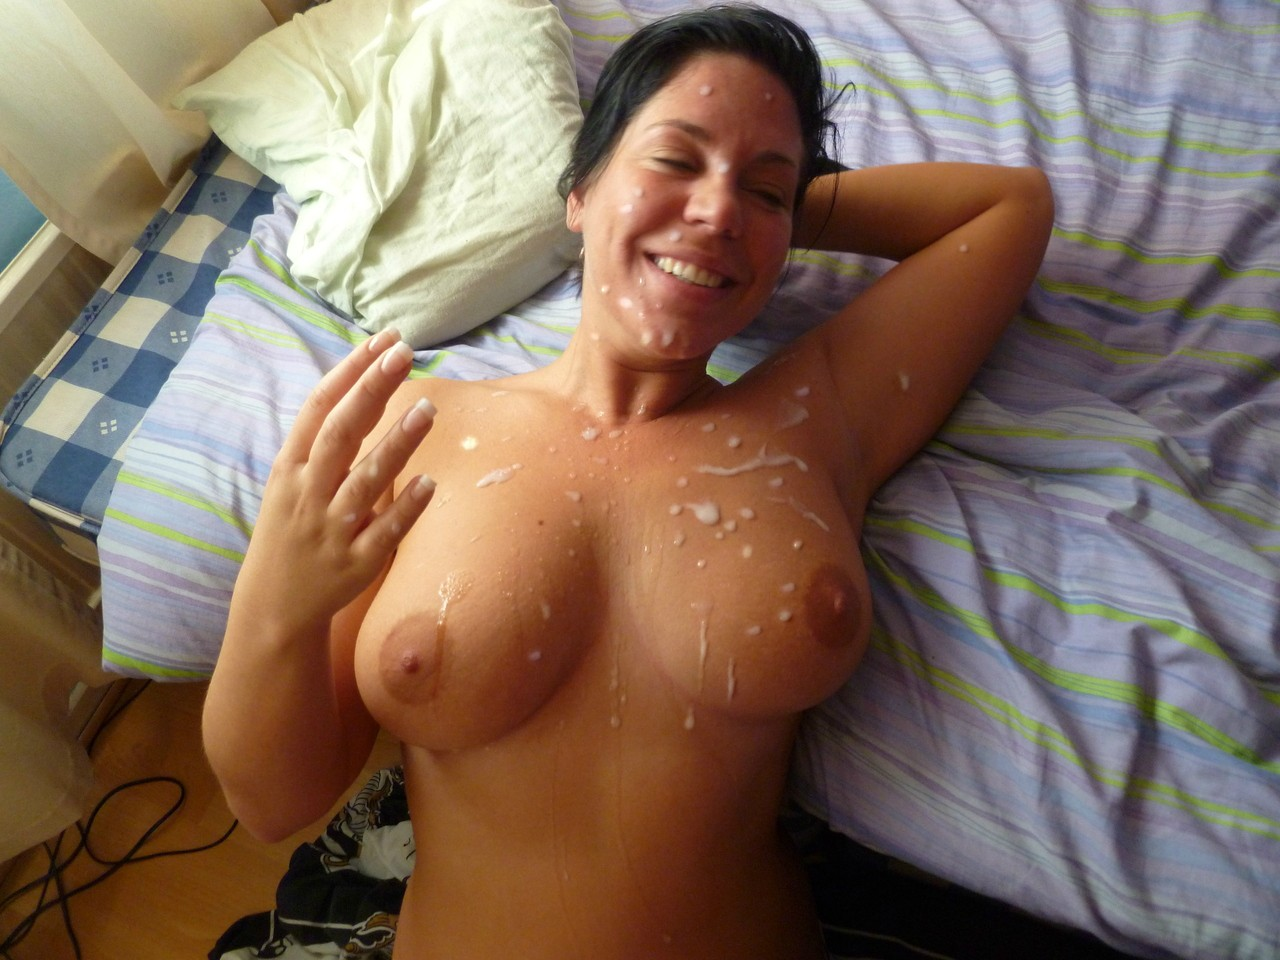 Big Tits Single - Happy Tits Porn Pic - EPORNER